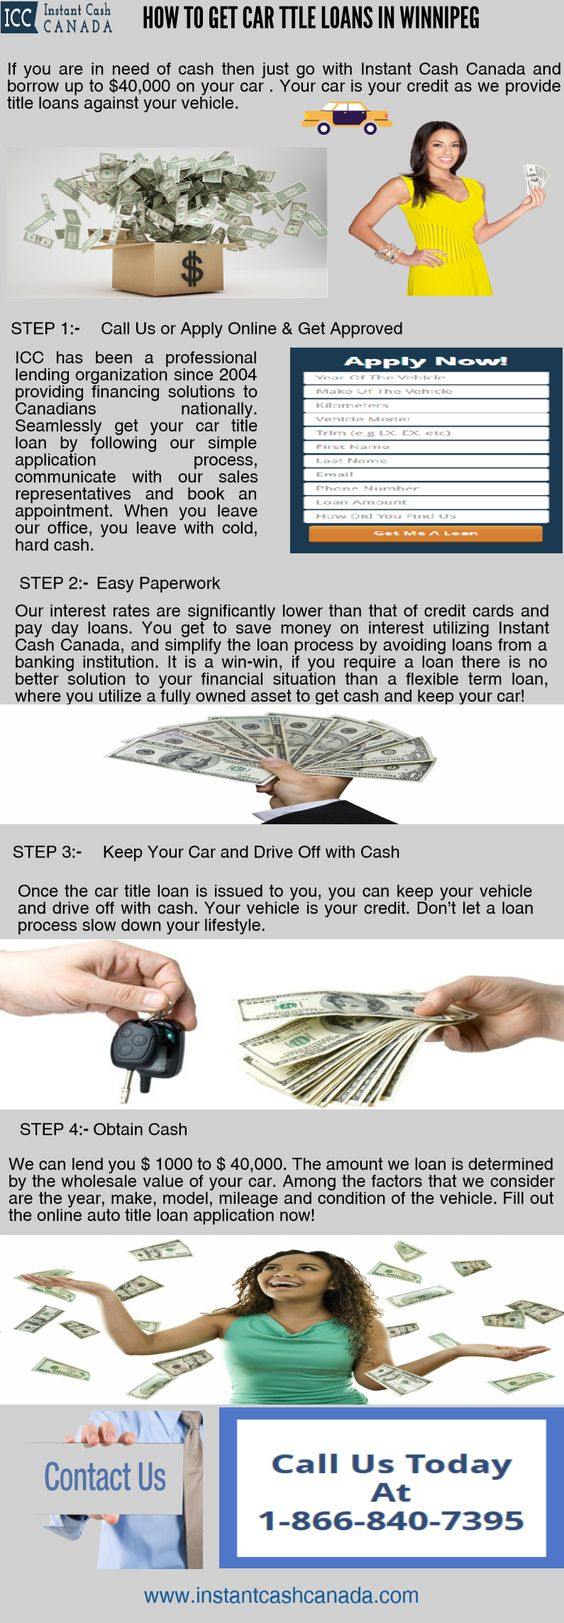 Fast cash loans sydney bad credit picture 5